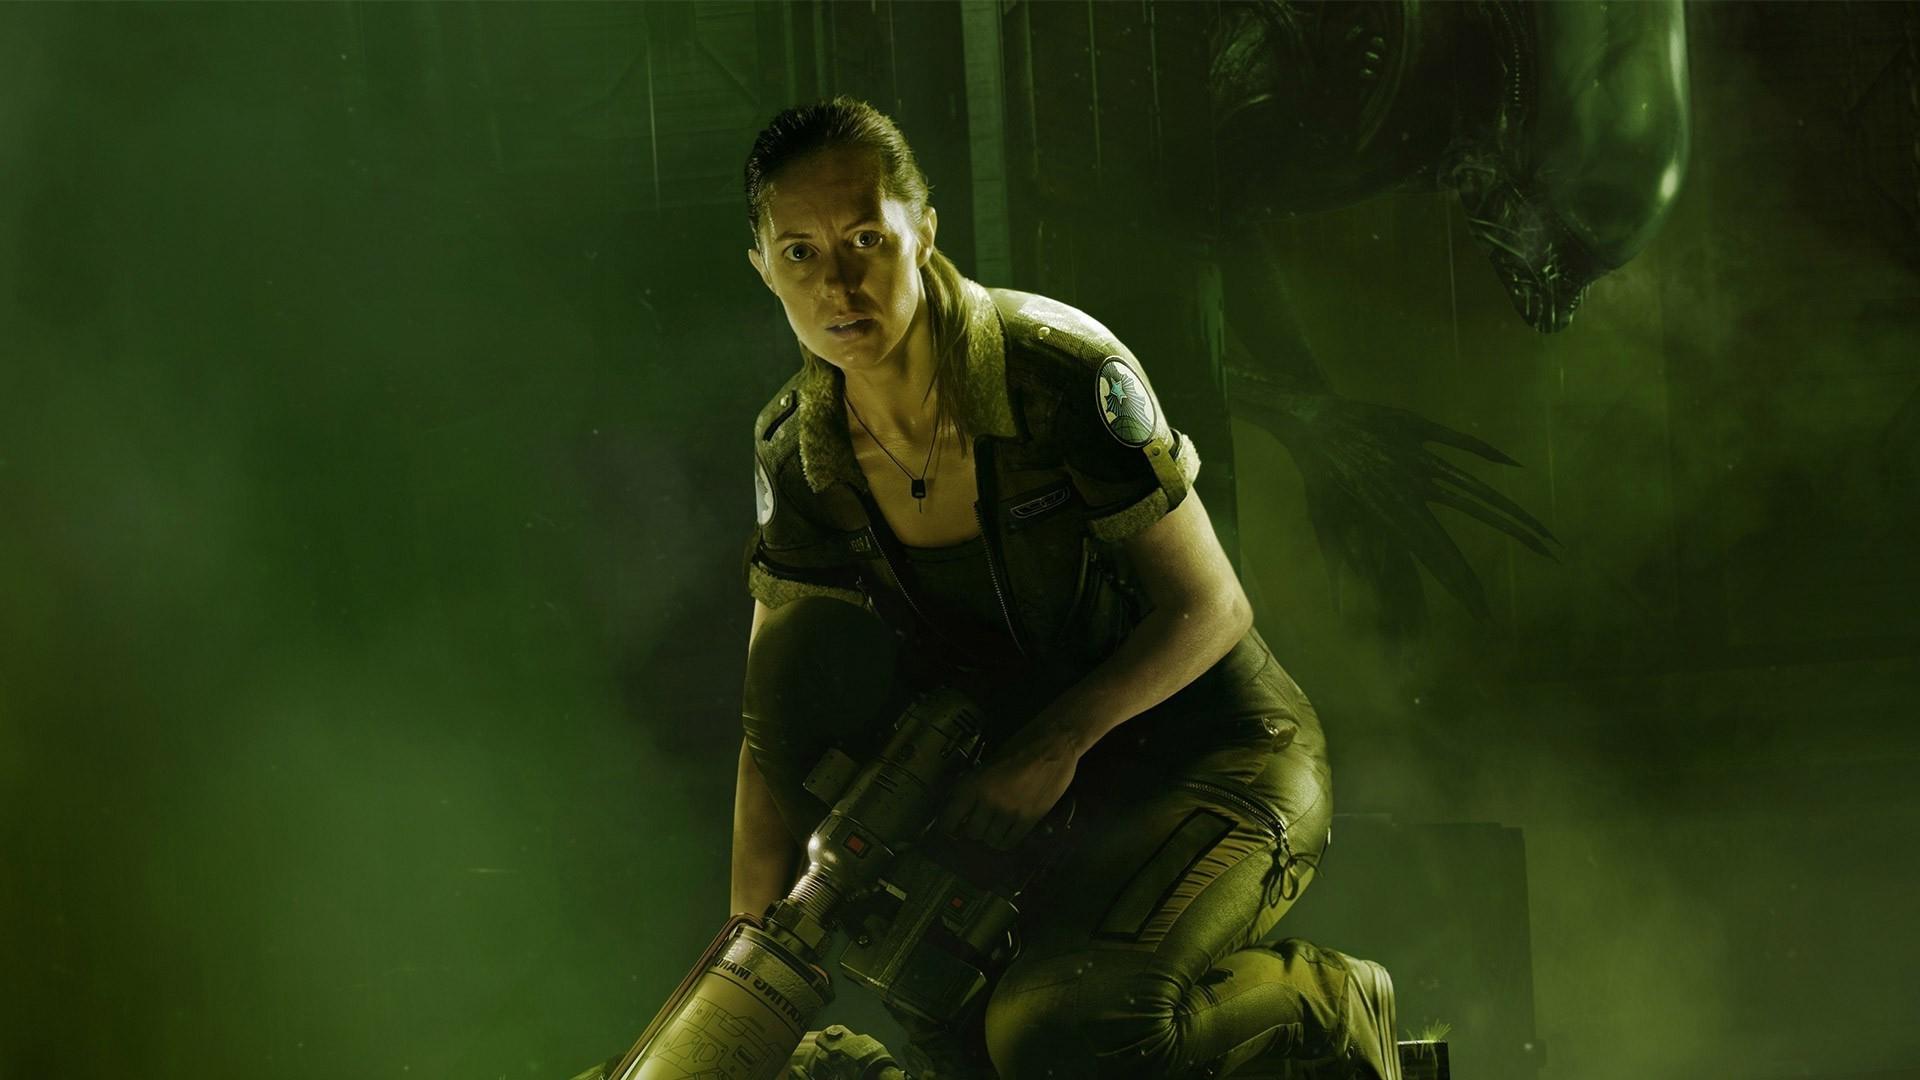 Amanda Ripley, Xenomorph, Alien: Isolation, Video Games Wallpapers HD /  Desktop and Mobile Backgrounds